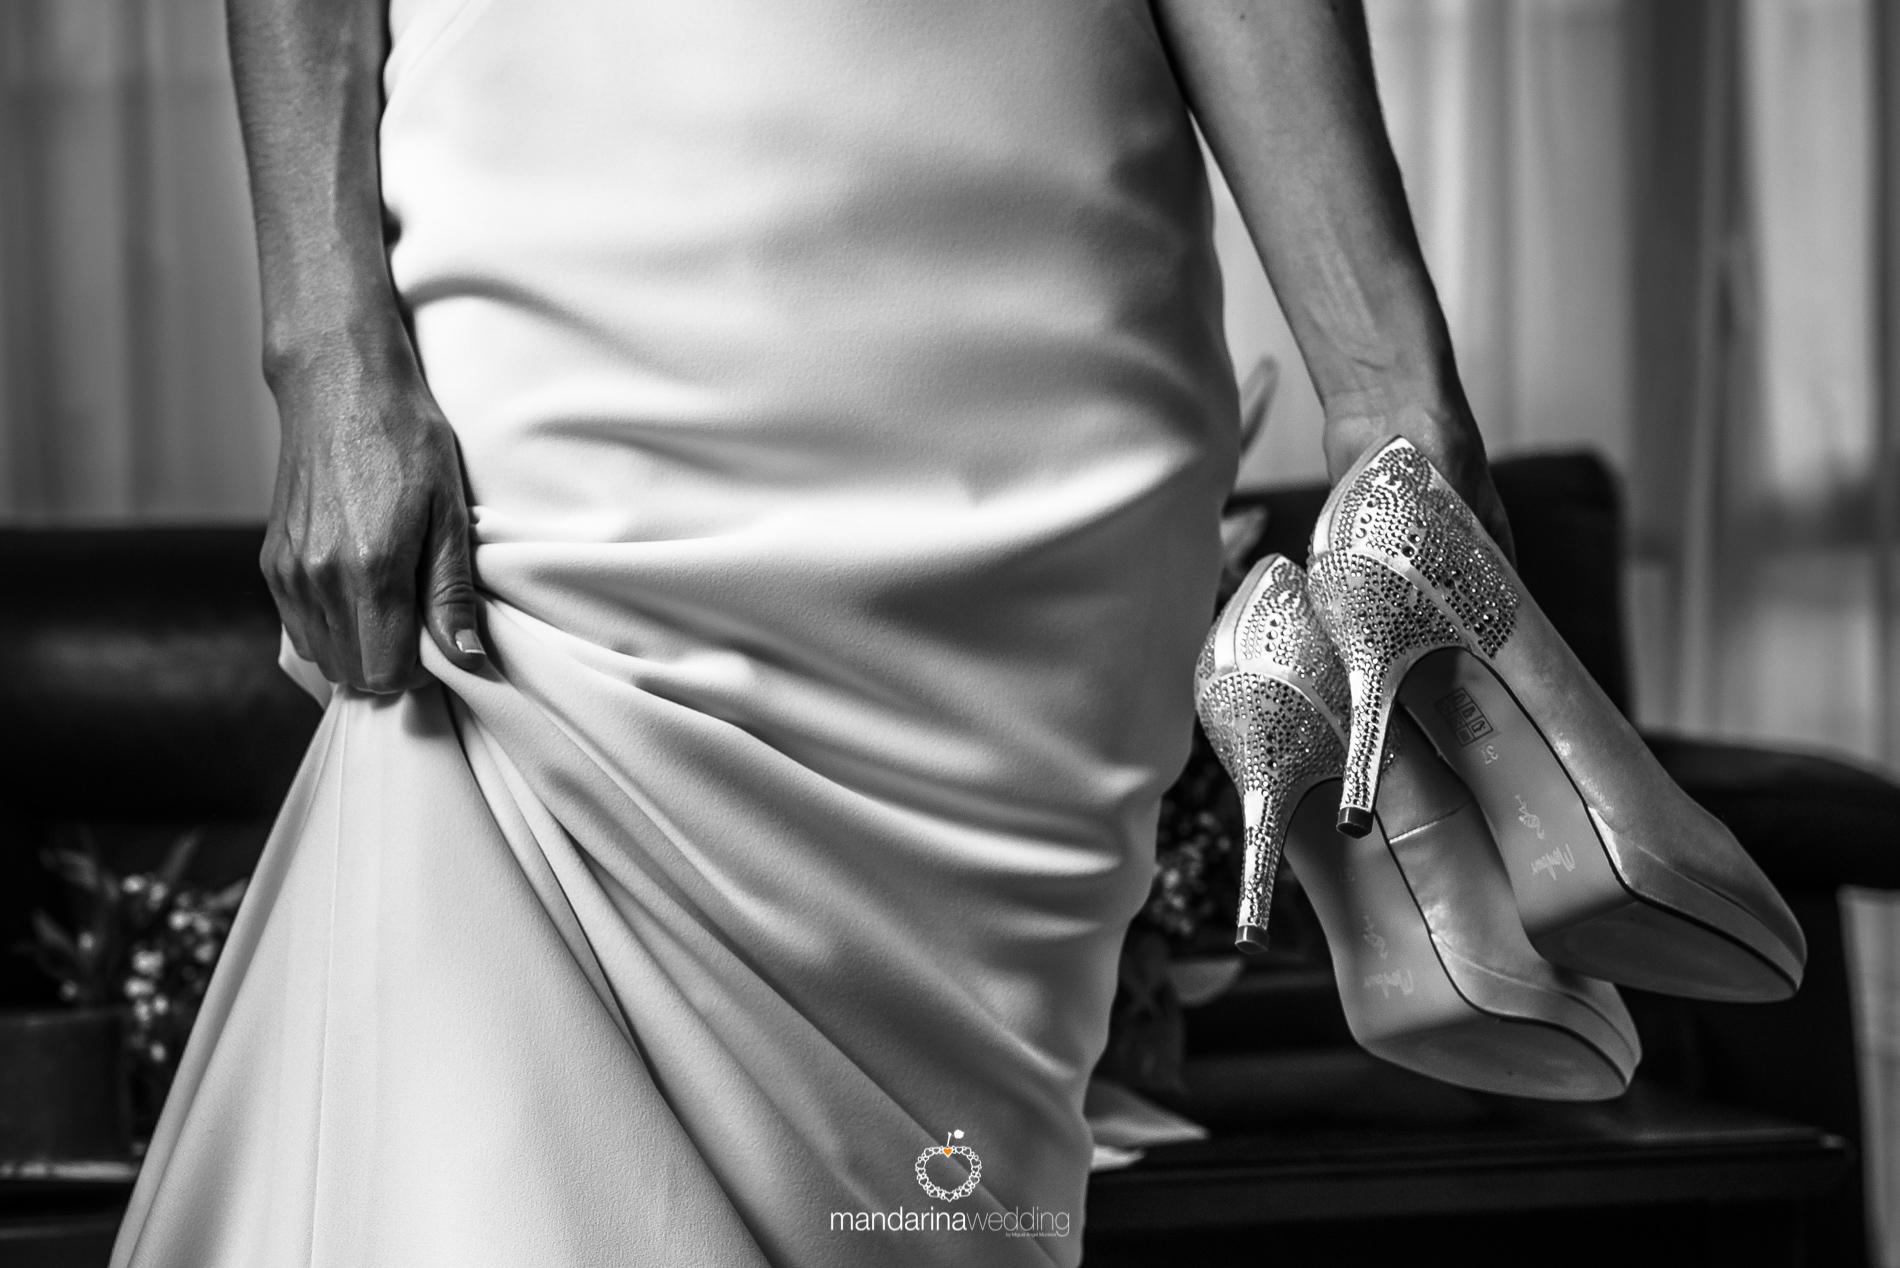 mandaria wedding, fotografos de boda, fotoperiodismo de boda, mejores fotografos de boda, bodas soria, bodas pirineo, bodas Madrid, fotógrafos tarragona_09